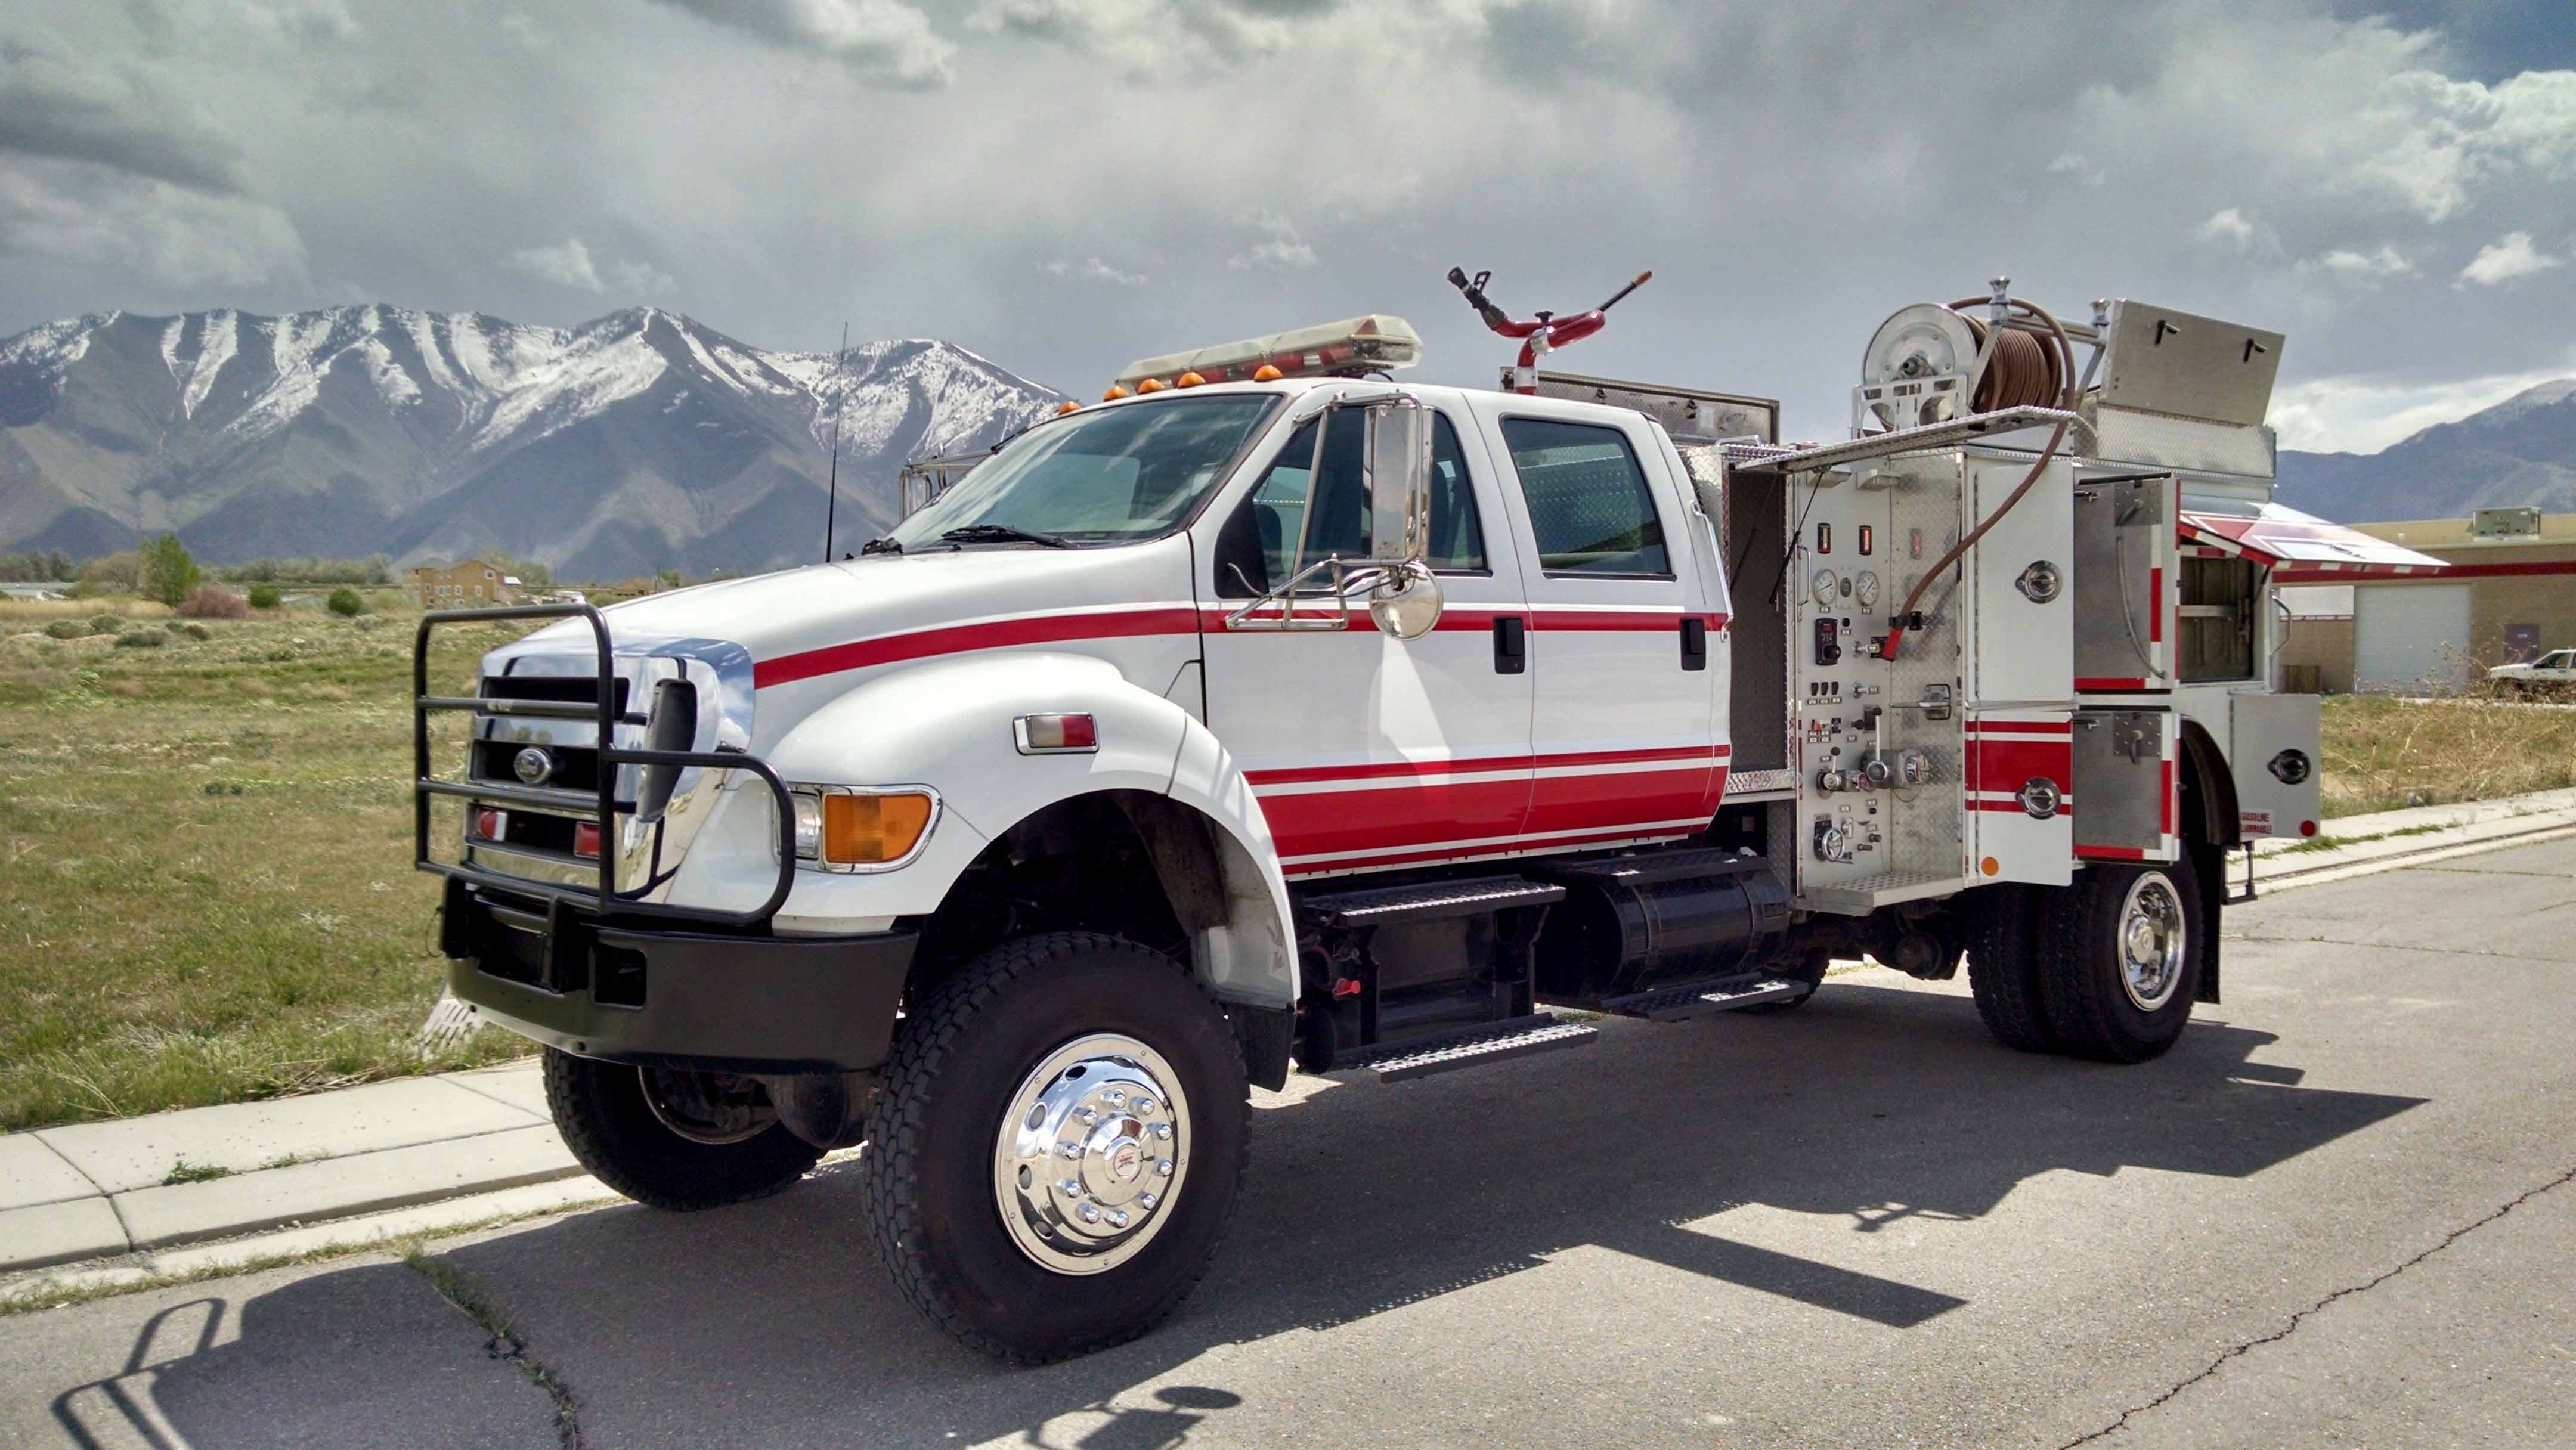 2005 ford f 750 fire truck 4 4 rtrucks. Black Bedroom Furniture Sets. Home Design Ideas